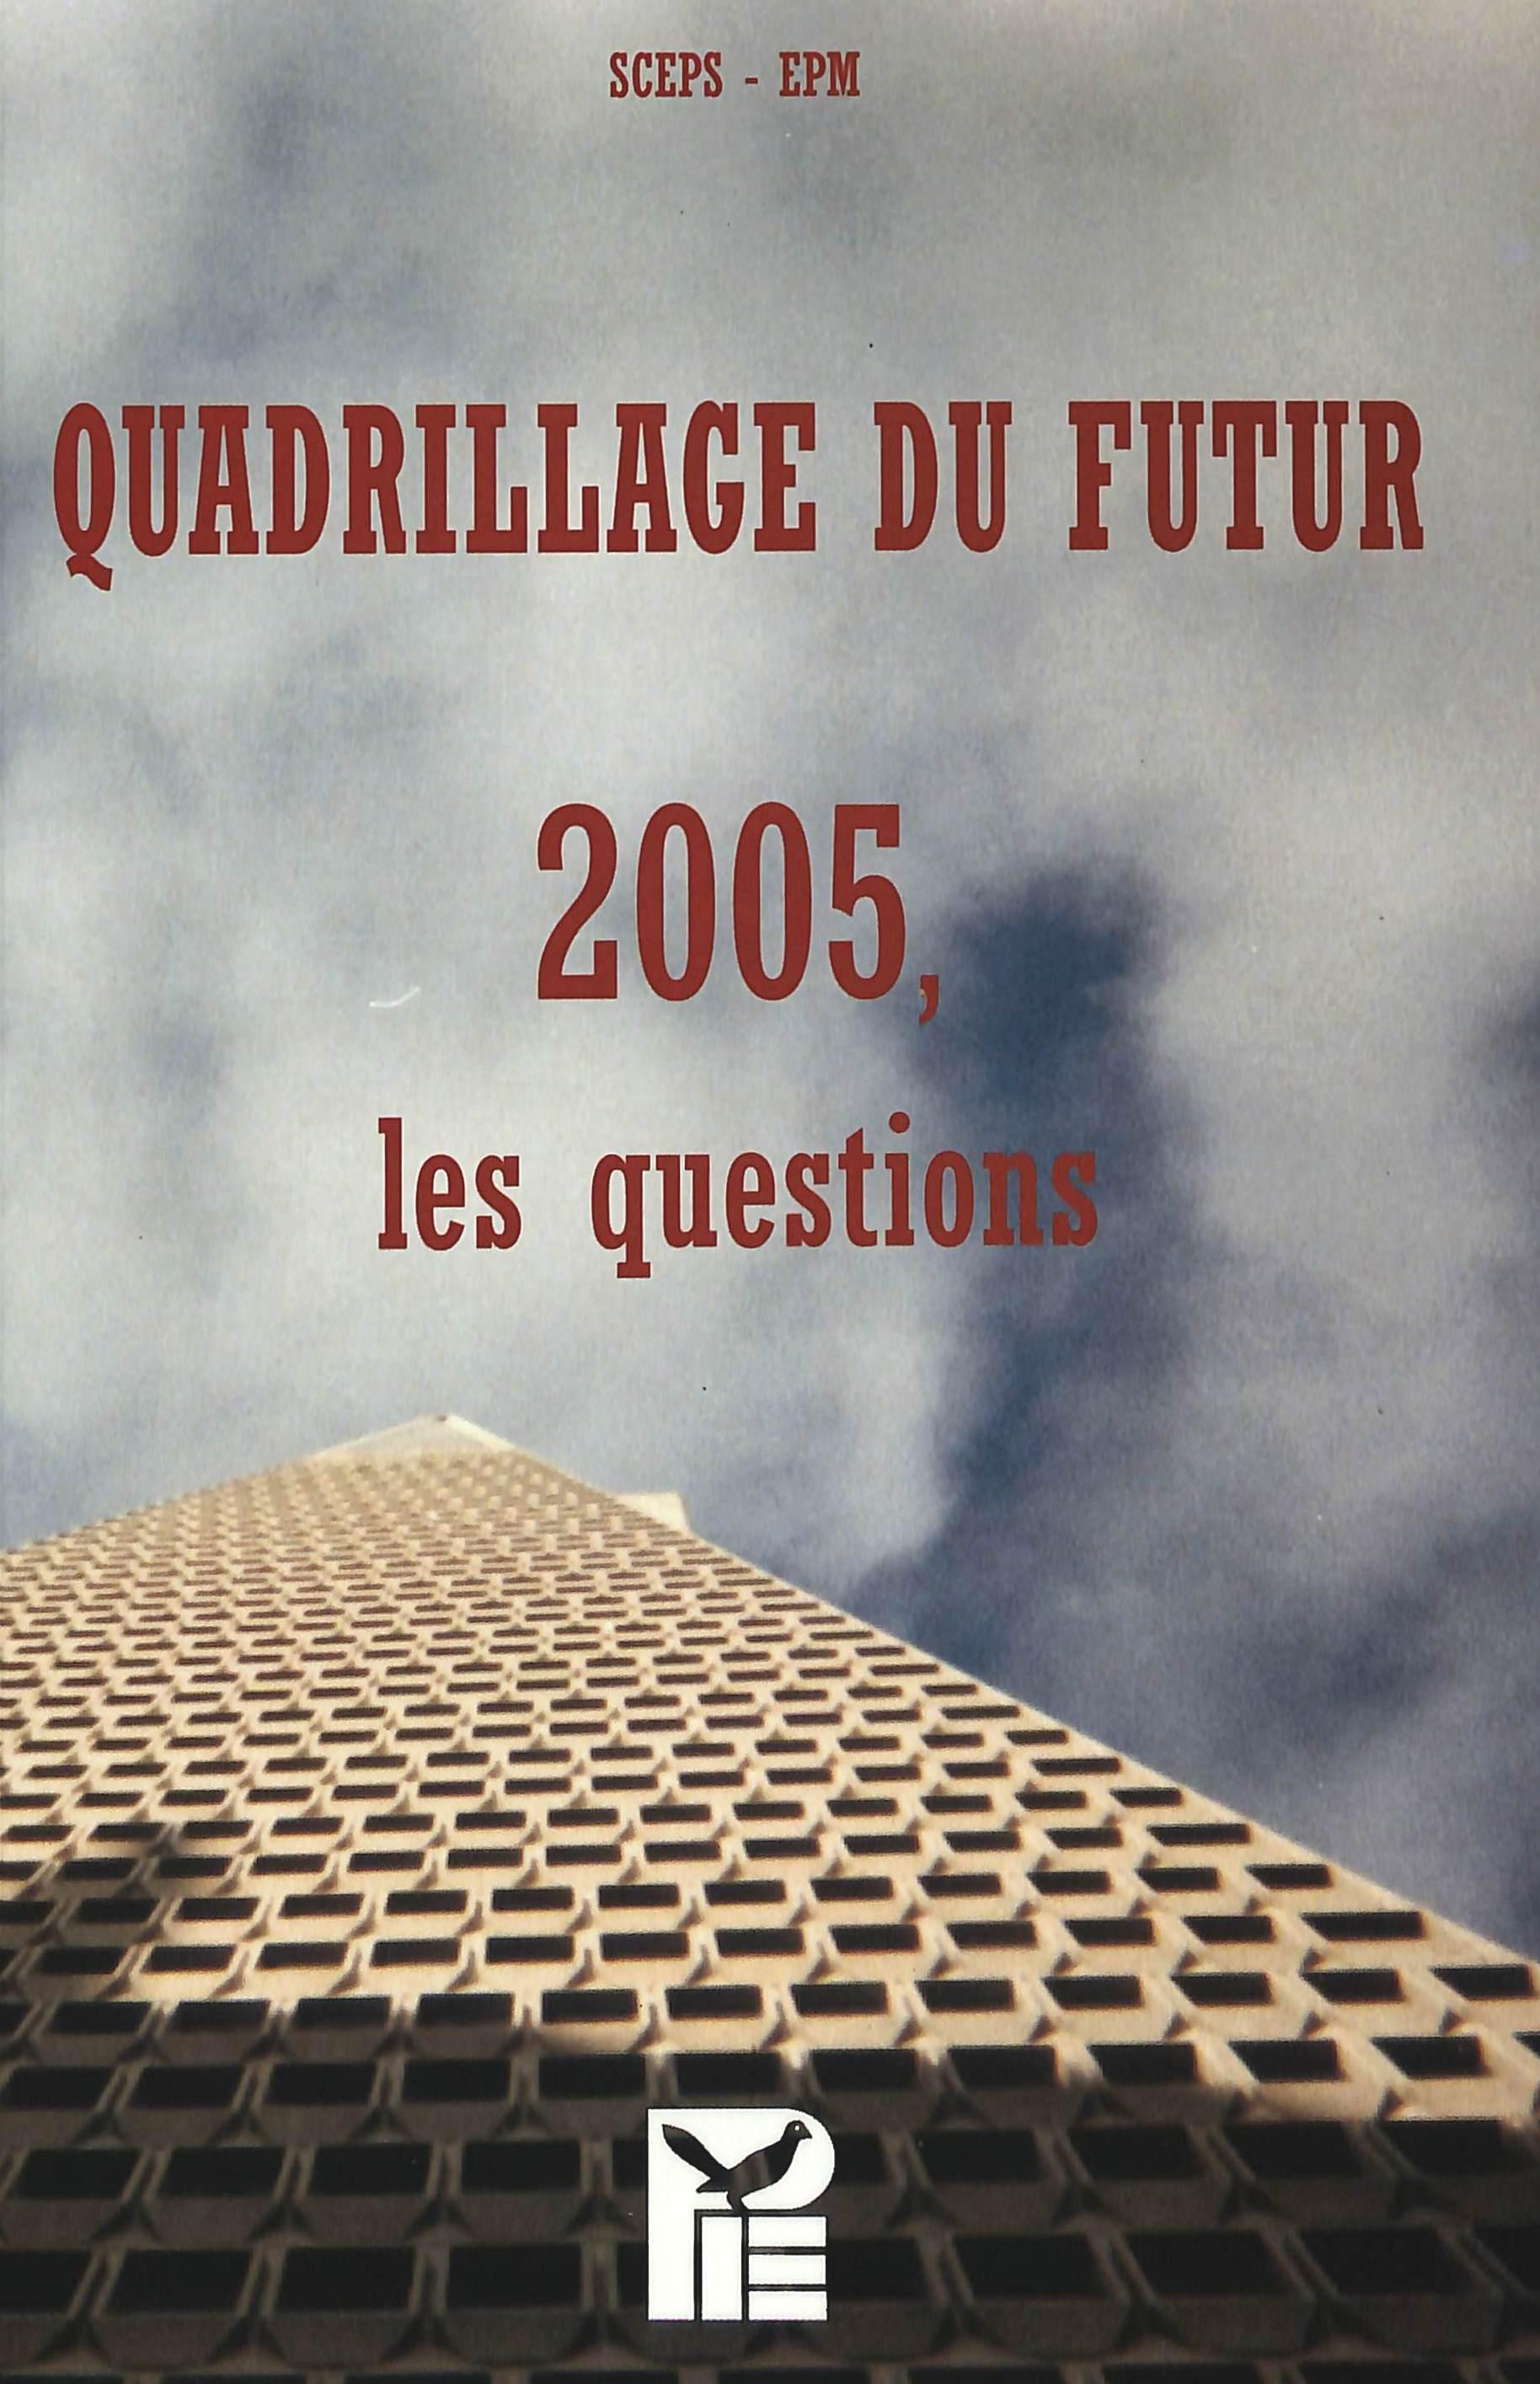 QUADRILLAGE DU FUTUR 2005 LES QUESTIONS